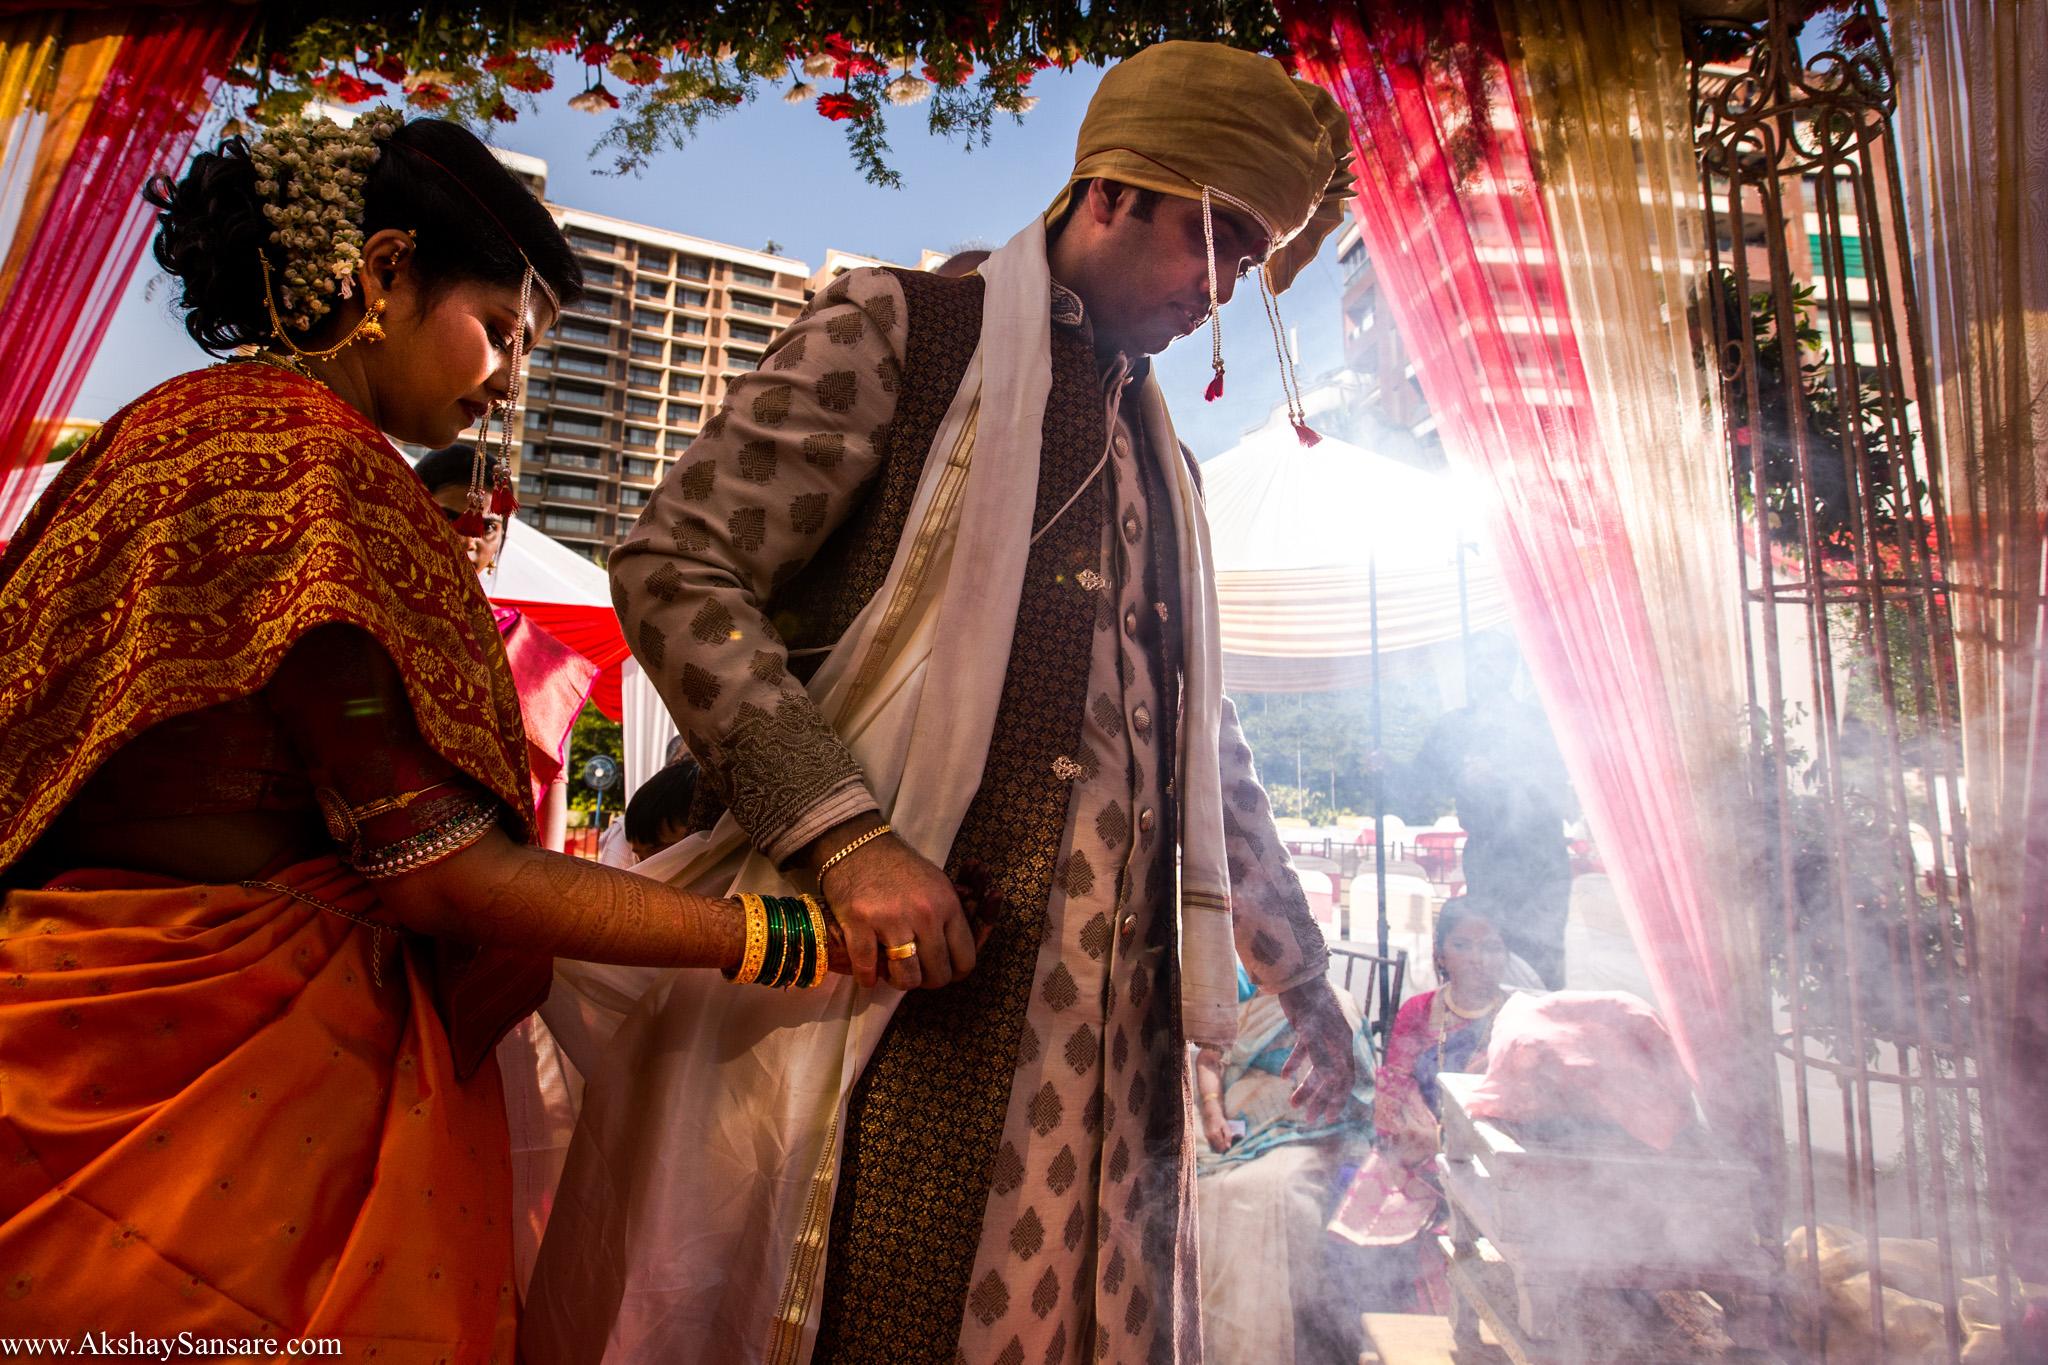 Salil x Kimaya Akshay Sansare Photography Candid wedding Photographer in mumbai best(23).jpg